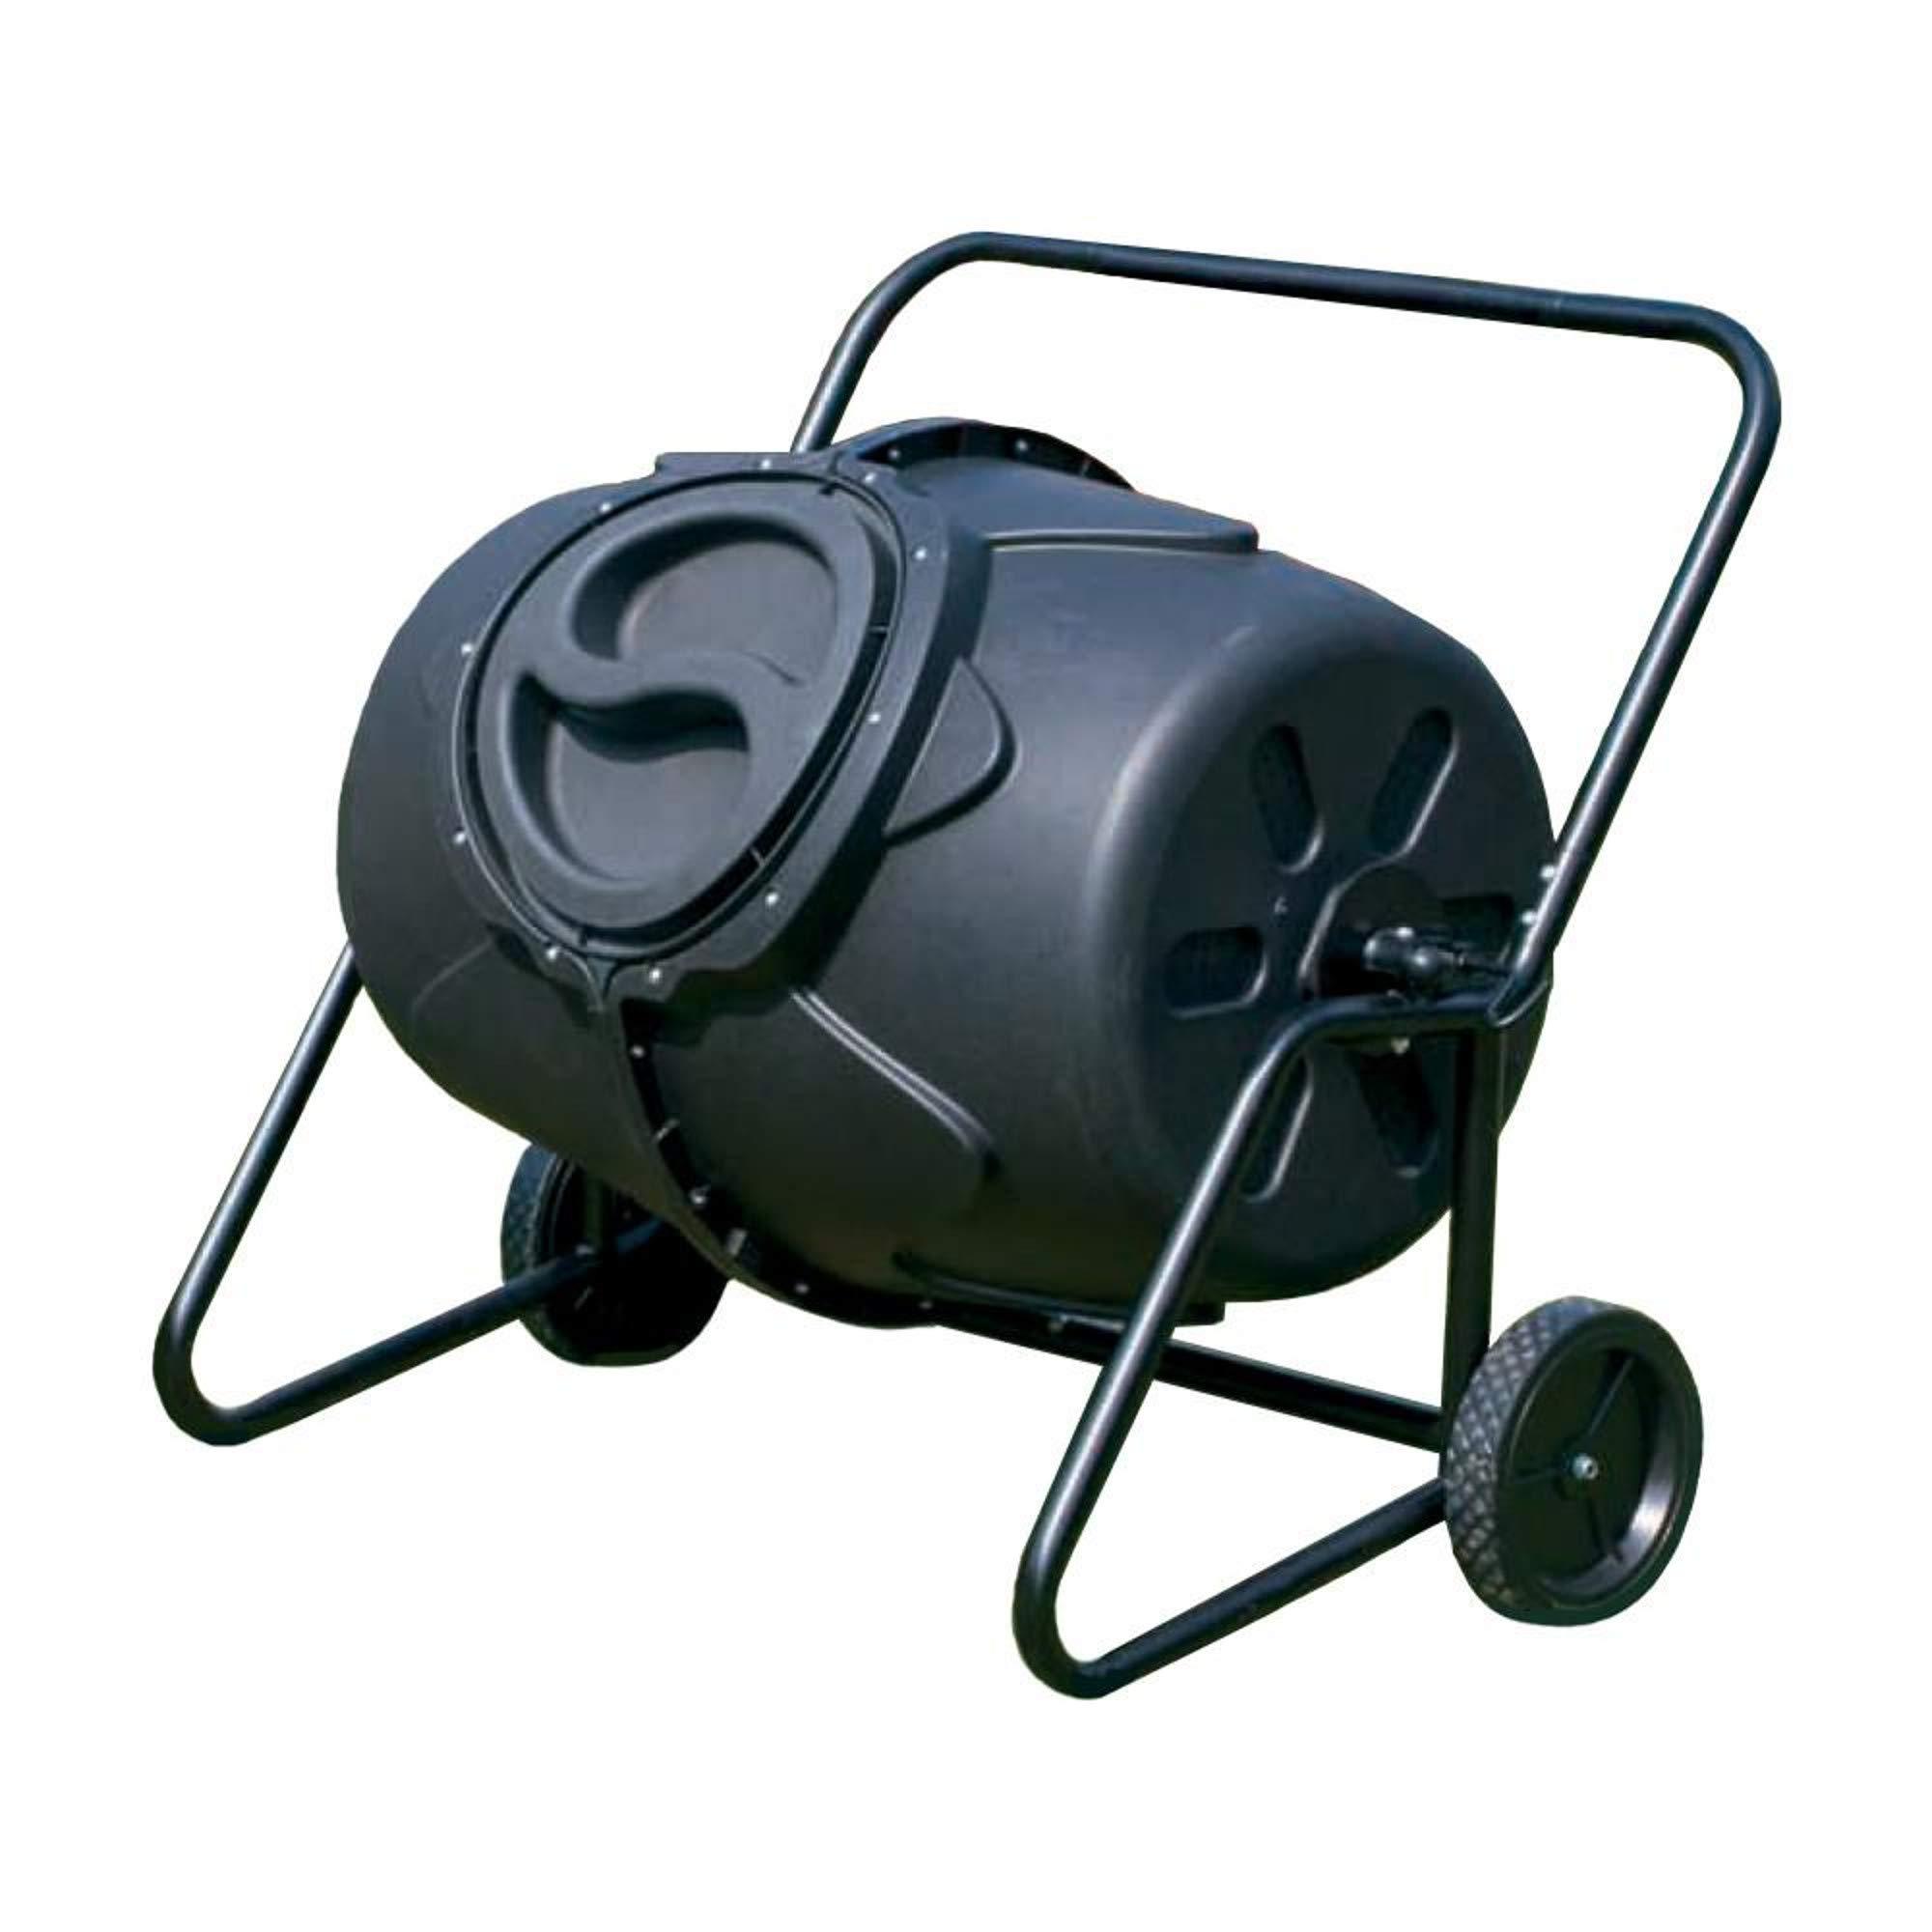 Riverstone Industries GEN-C50 Compost Tumbler, Black